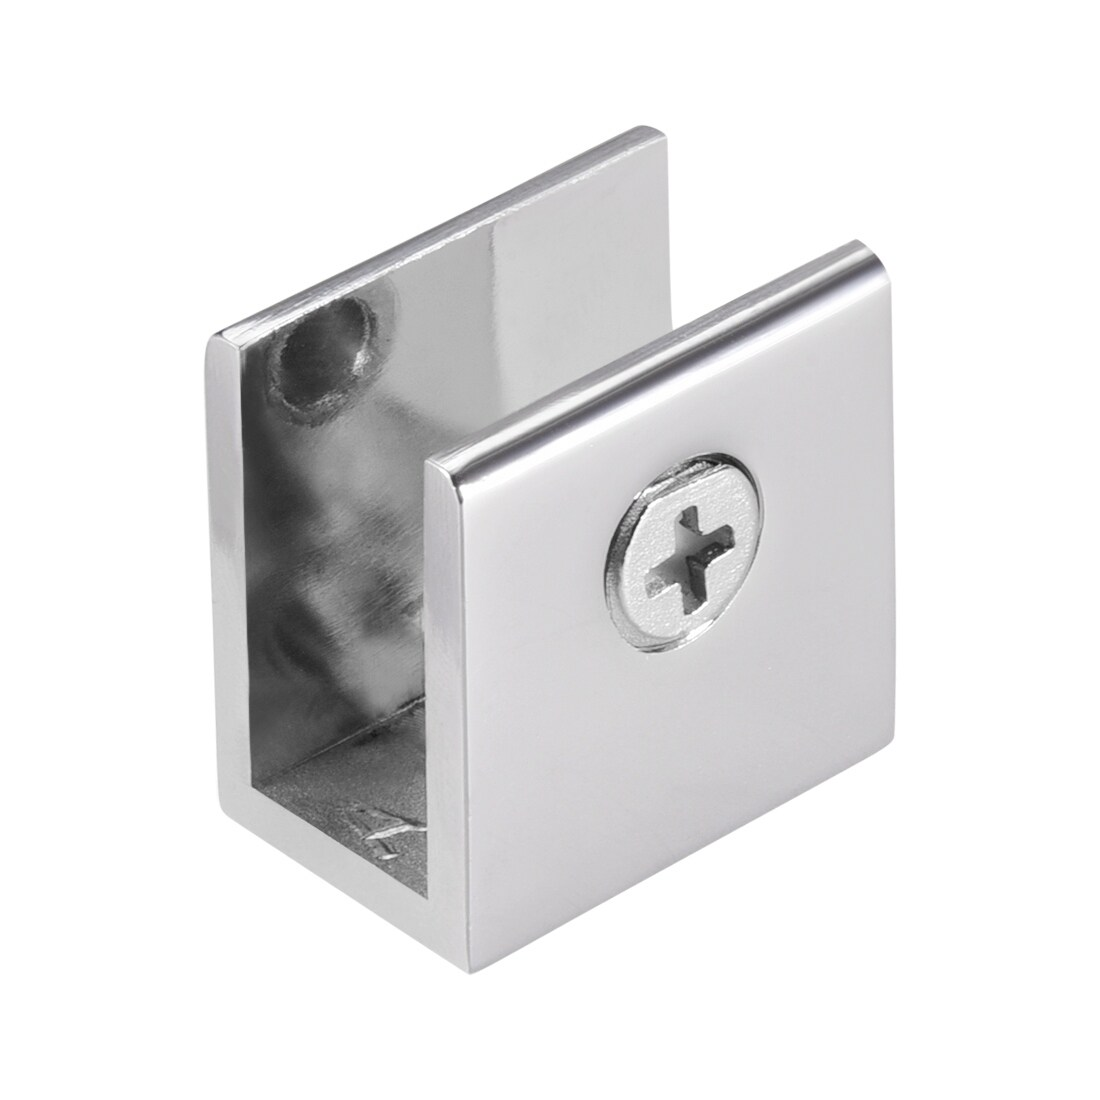 4x Glass Shelf Support Clamps Bracket 3-13mm Zinc Alloy Chrome Polished #US